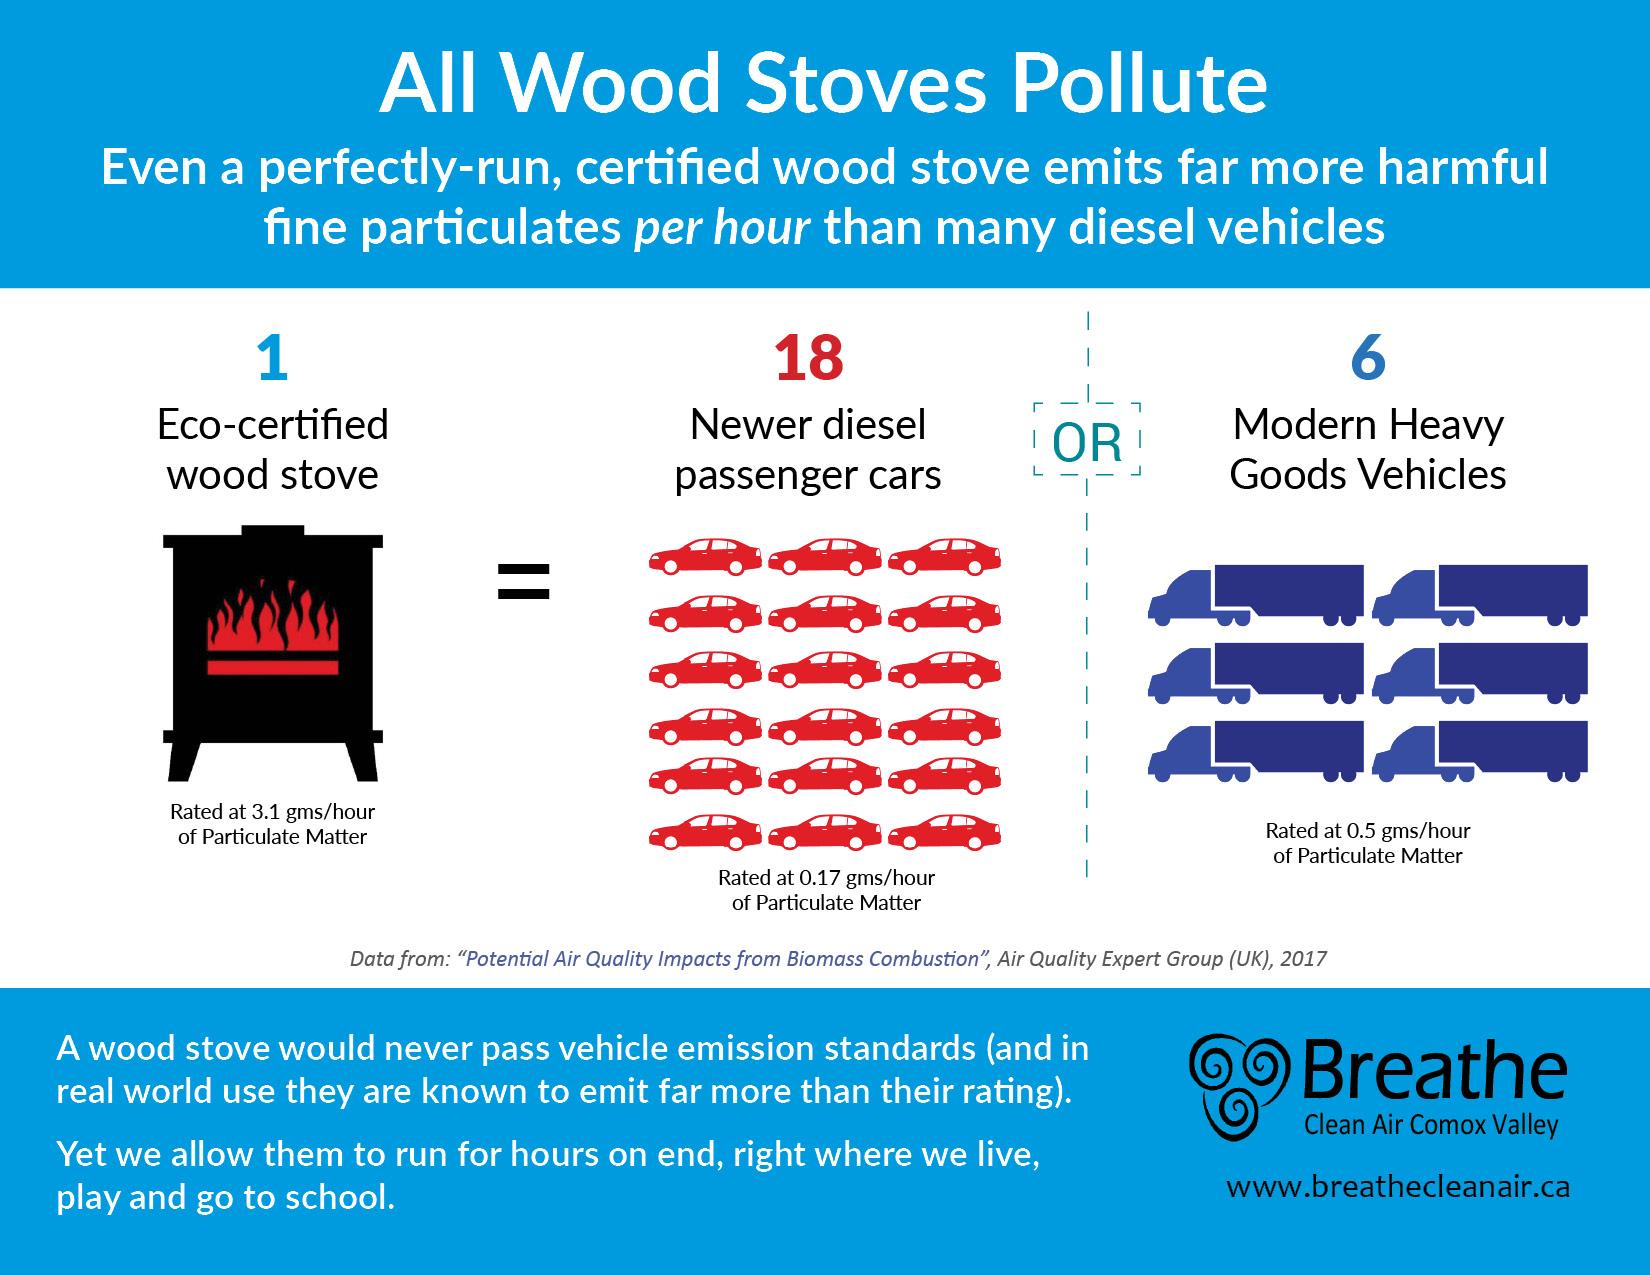 Stove vs Vehicles